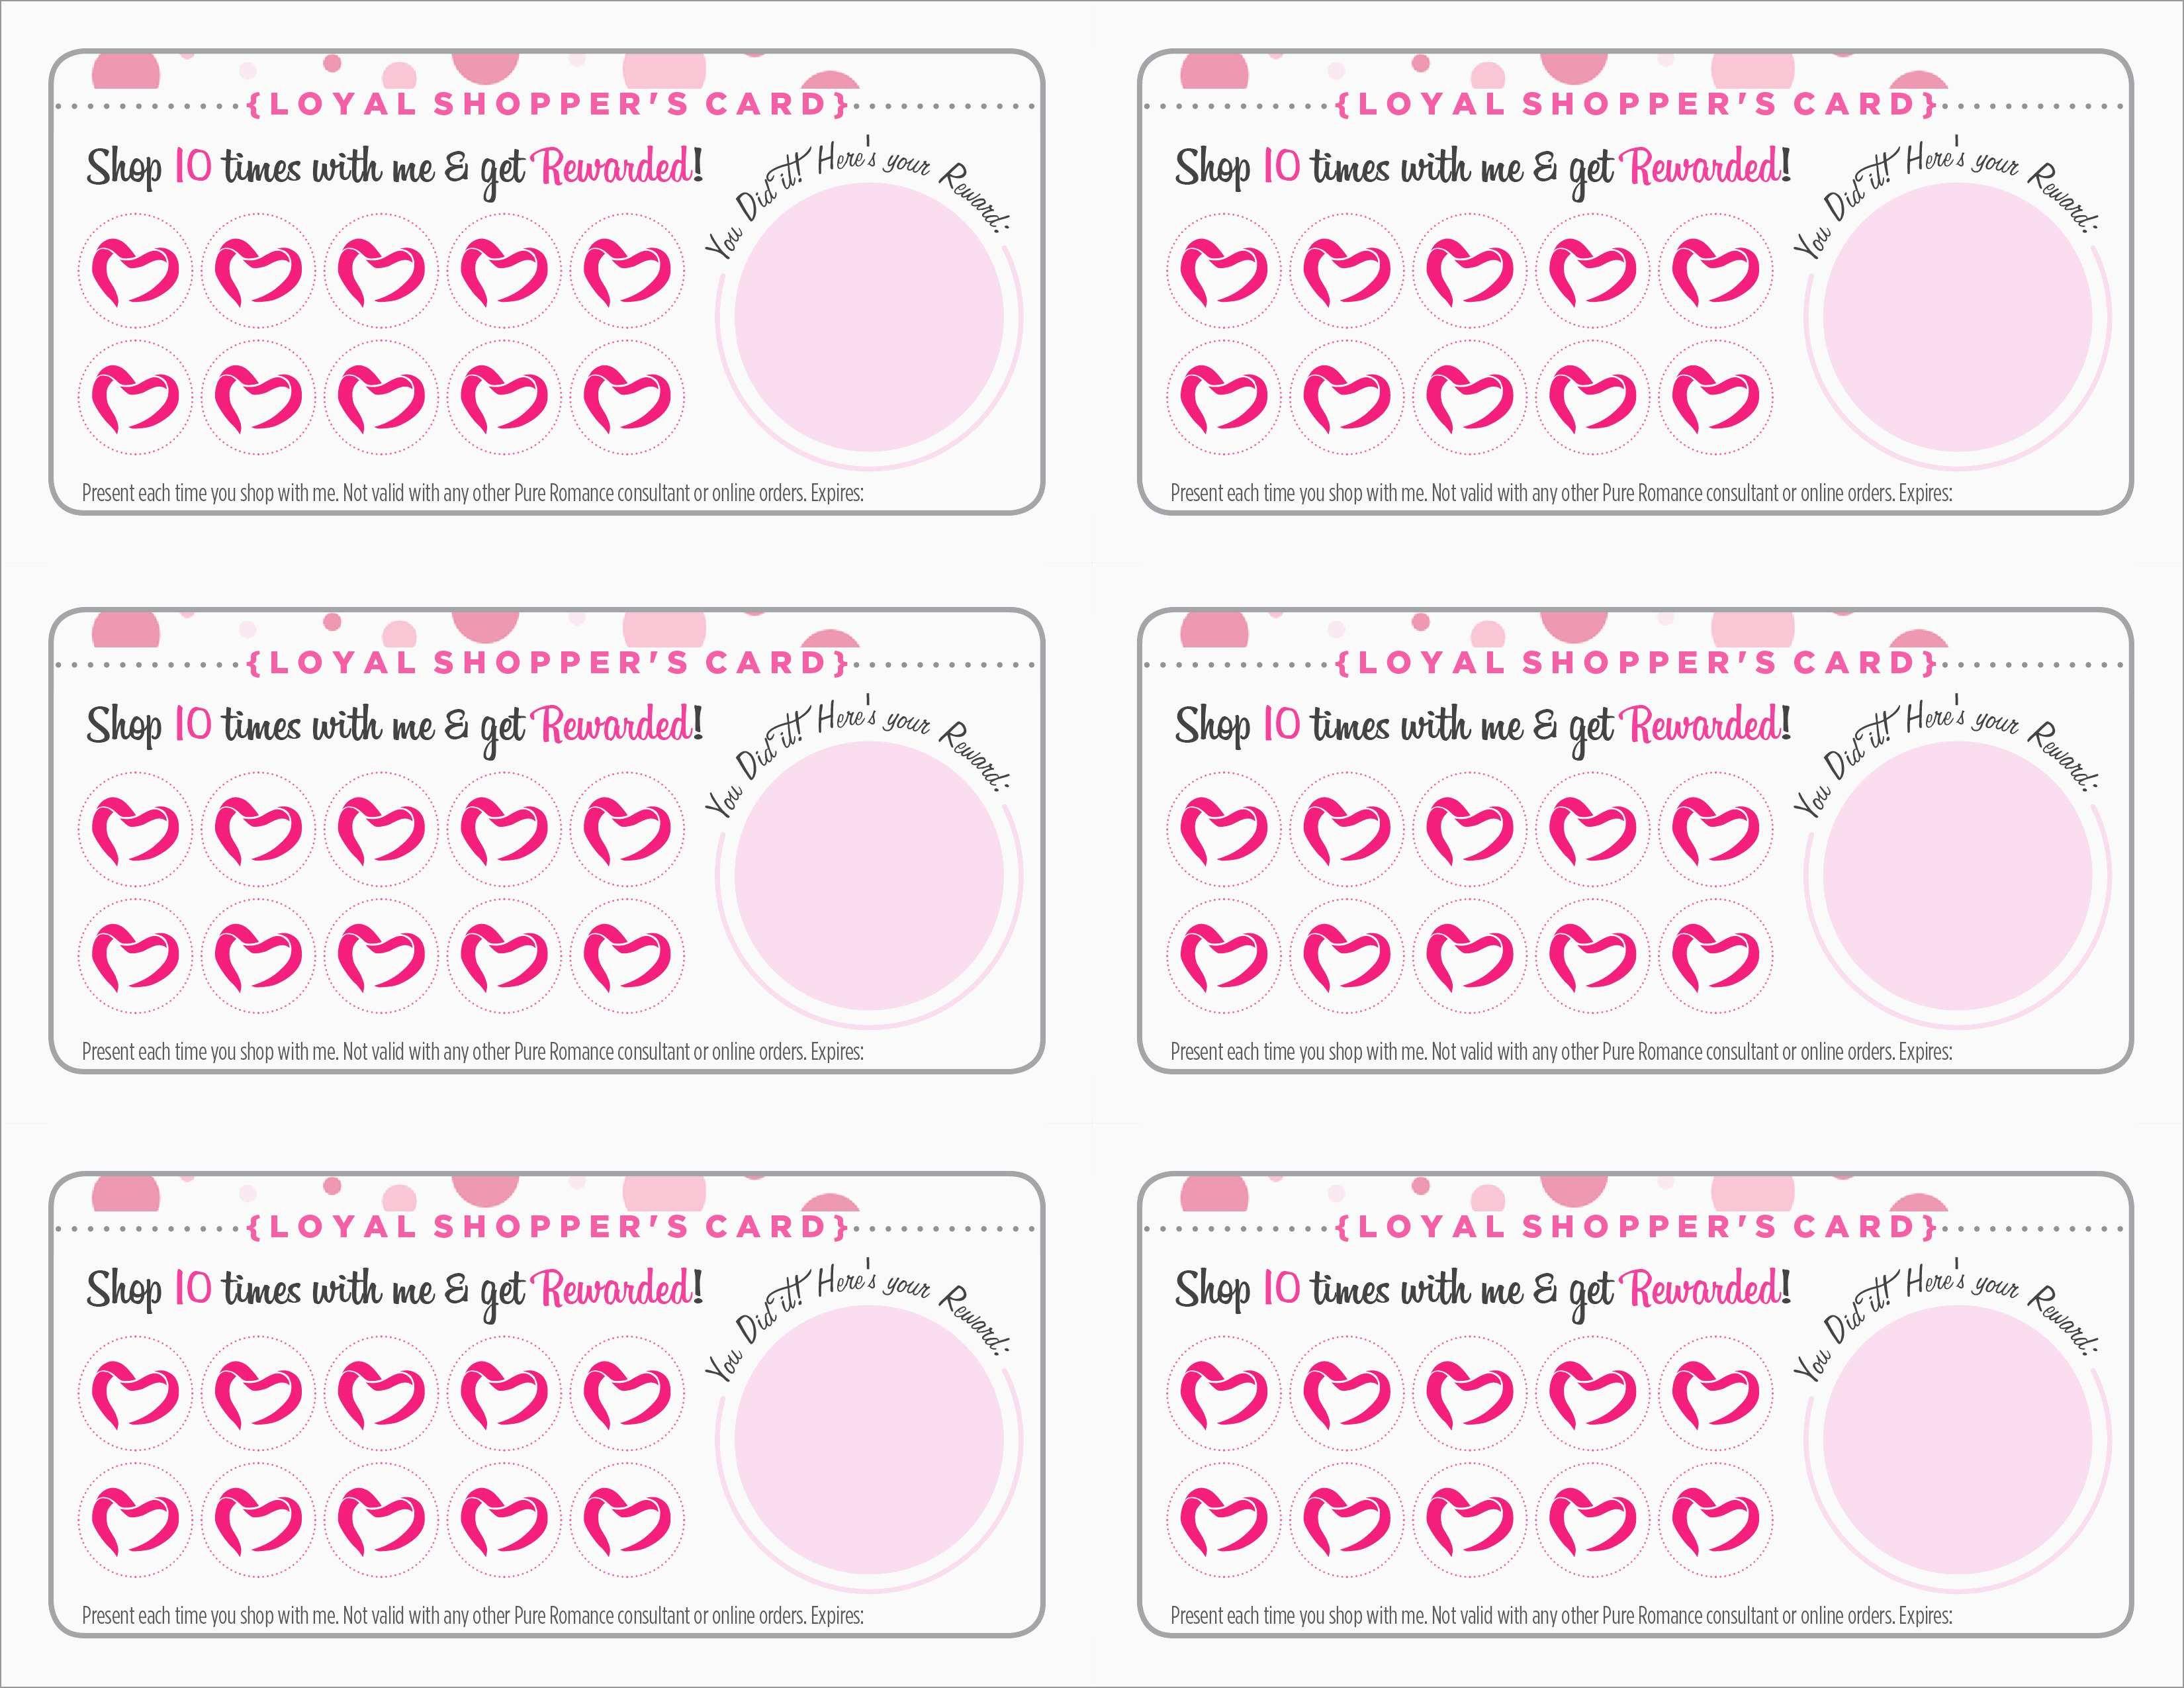 Free Printable Loyalty Card Template Fabulous 10 1 Free Punch Card - Free Printable Loyalty Card Template